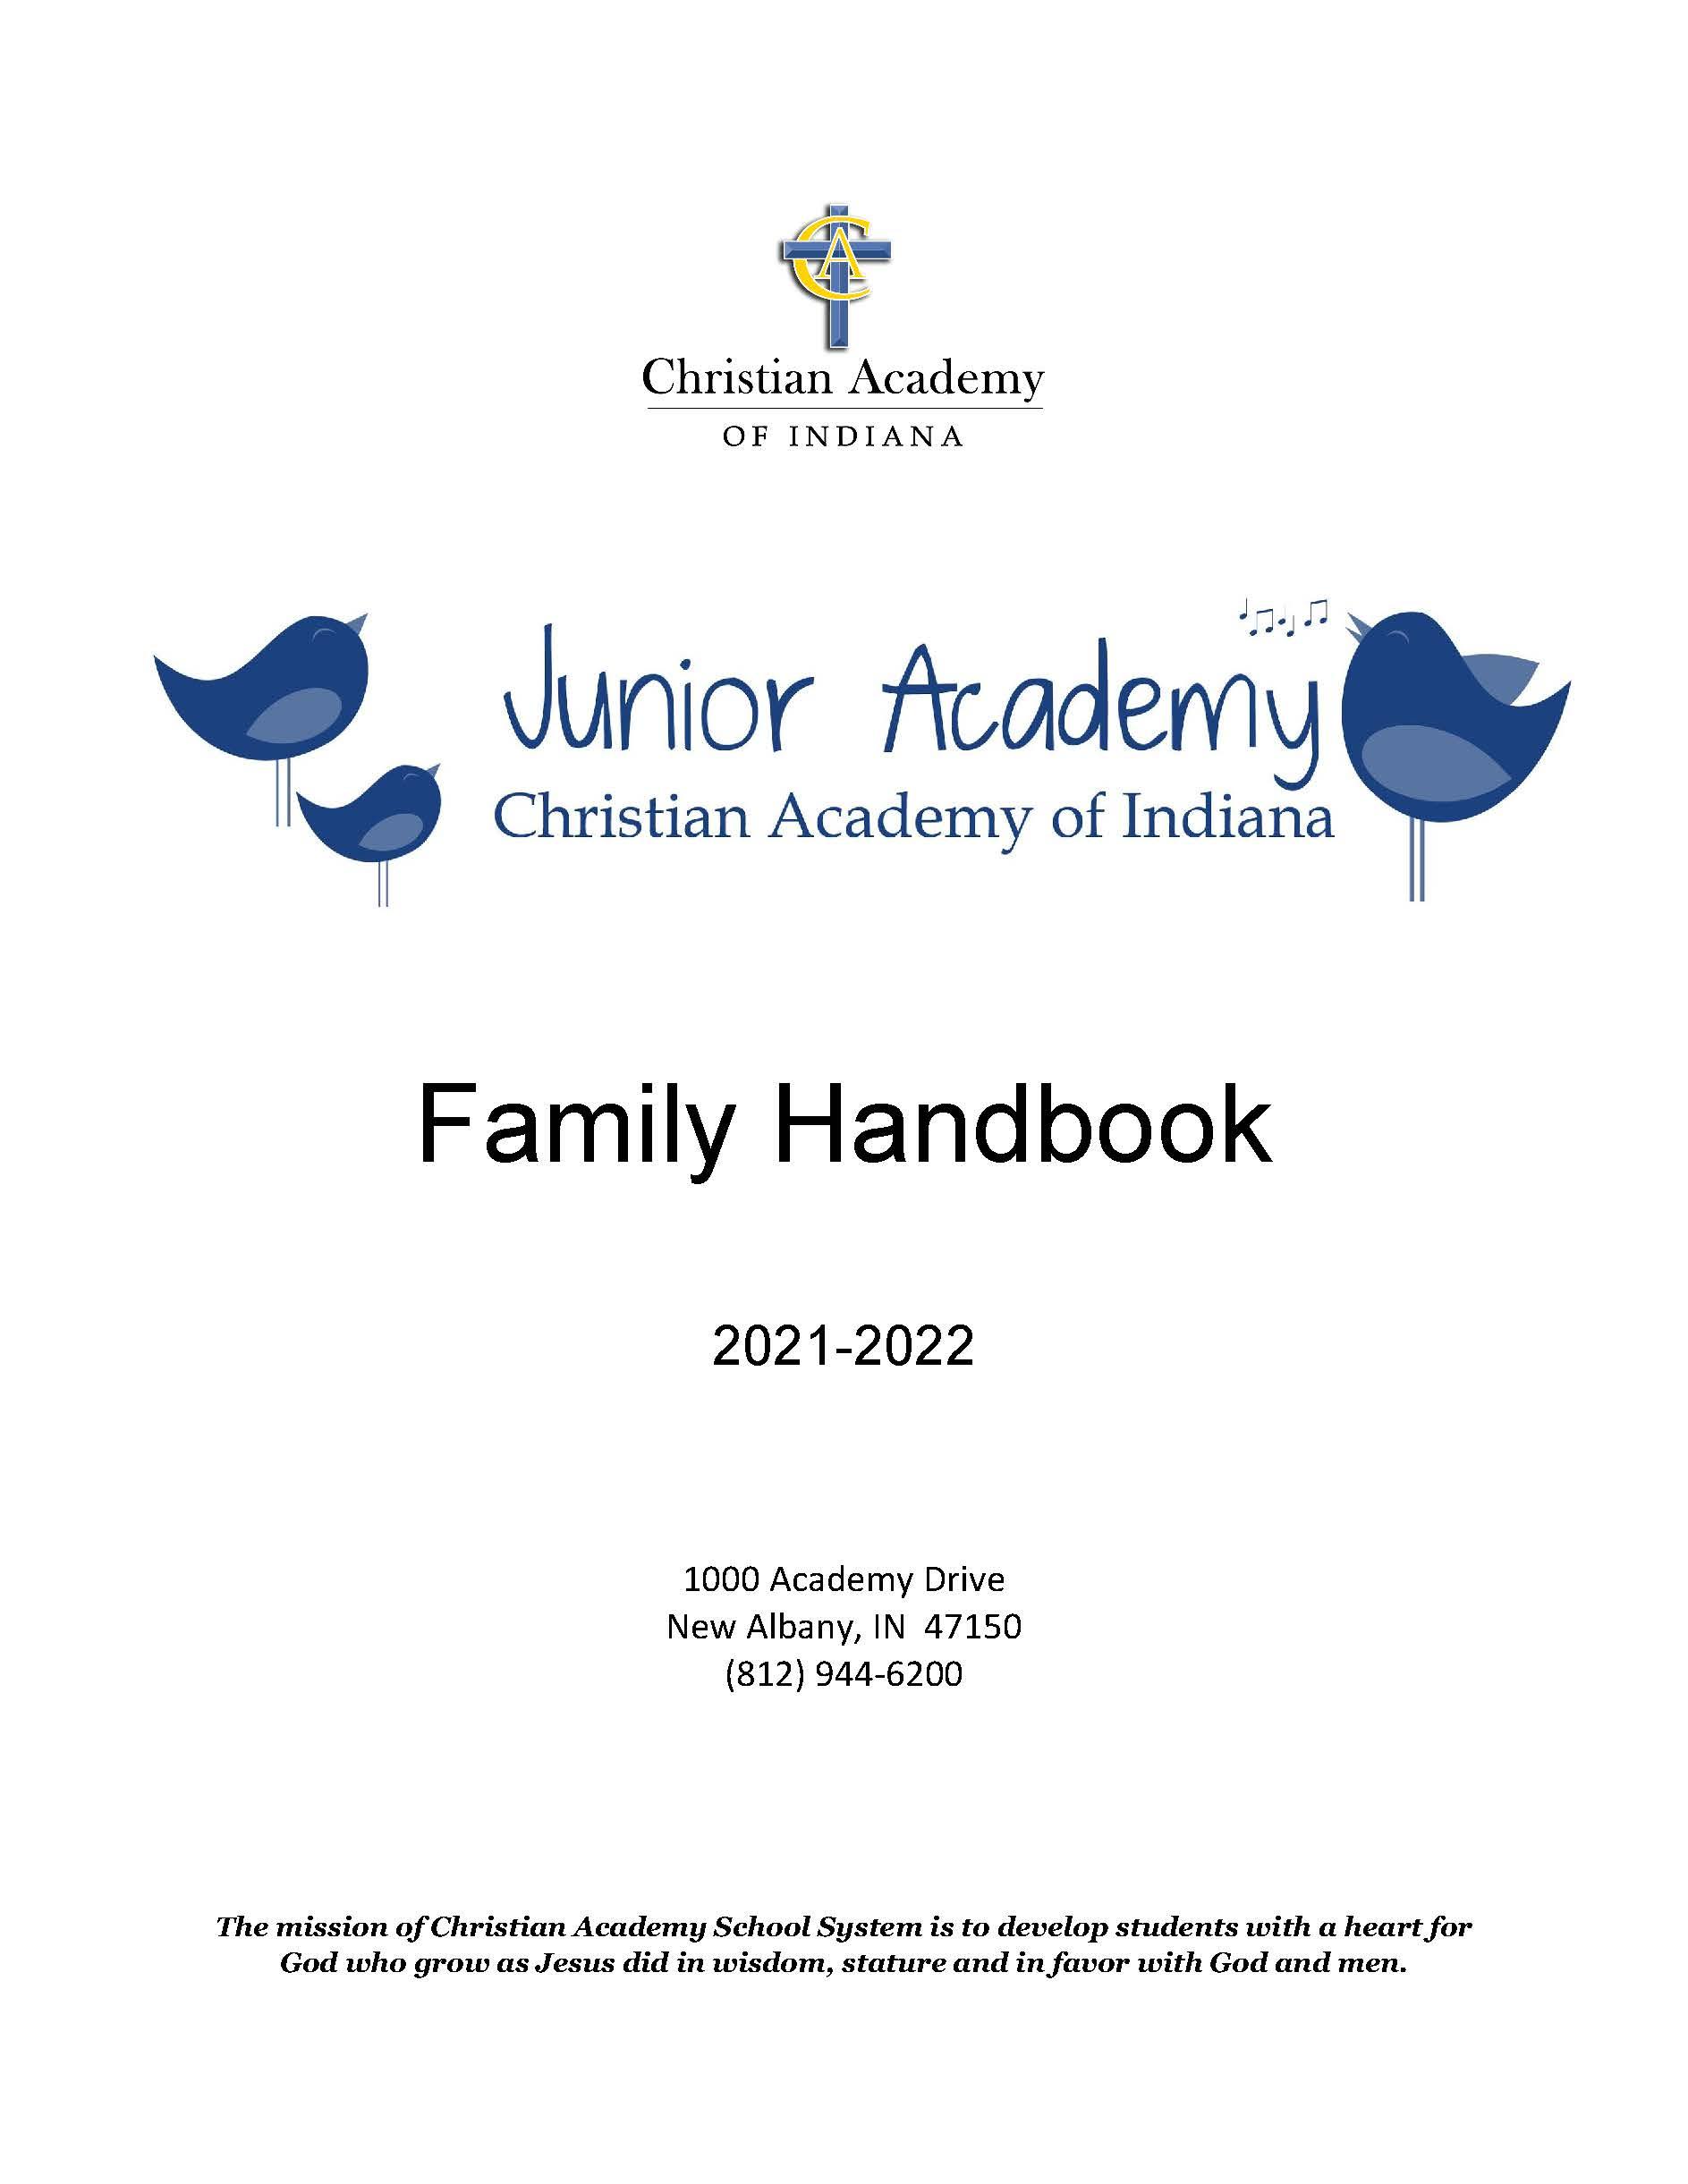 Christian Academy School System   Christian Academy of Indiana Junior Academy   2021-2022 Family Handbook